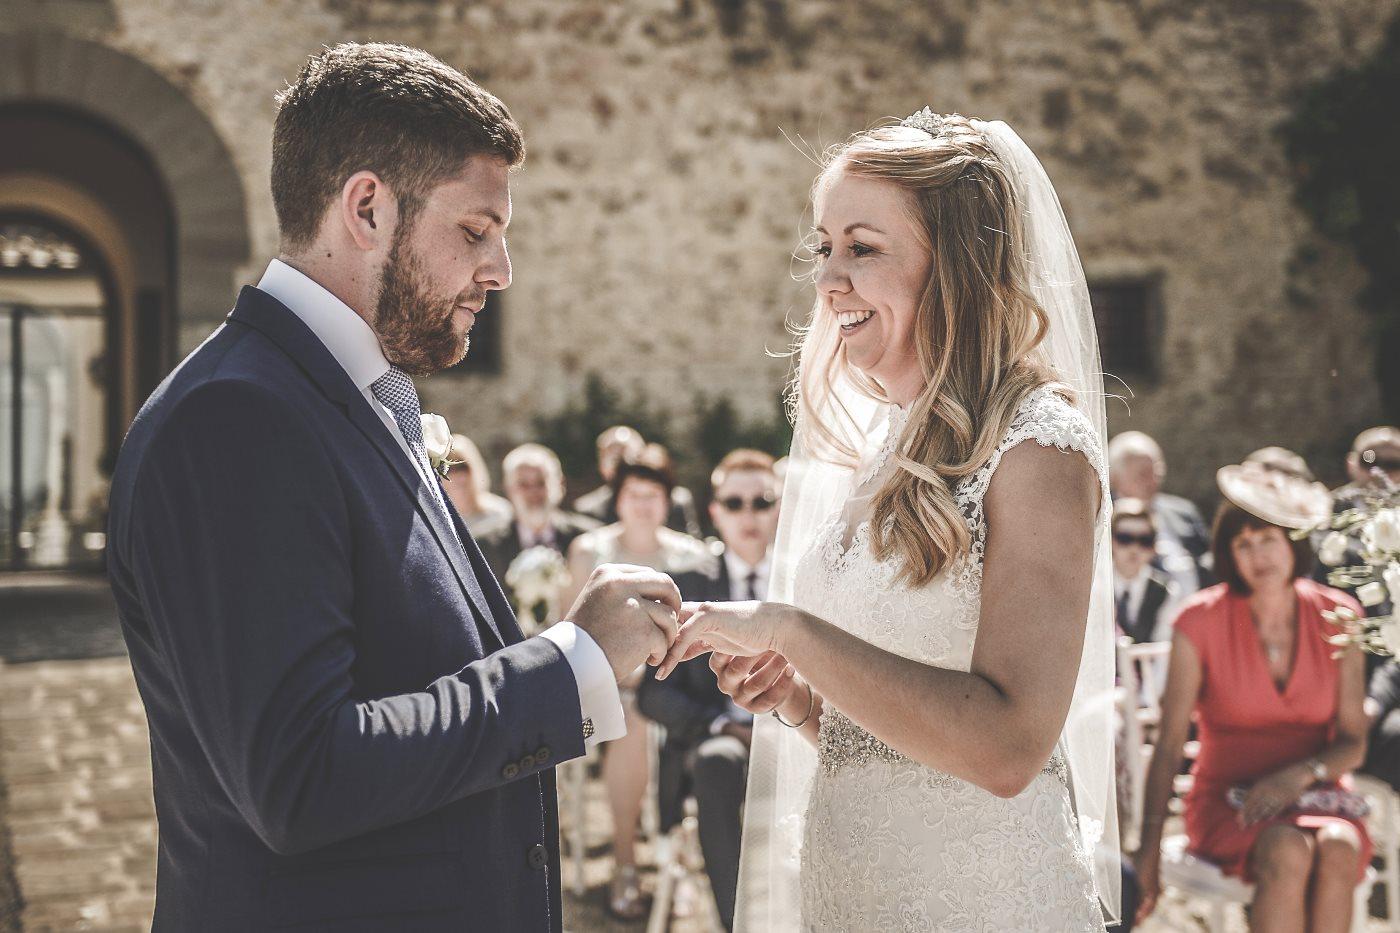 wedding_photos_castello_di_gabbiano_06.jpg